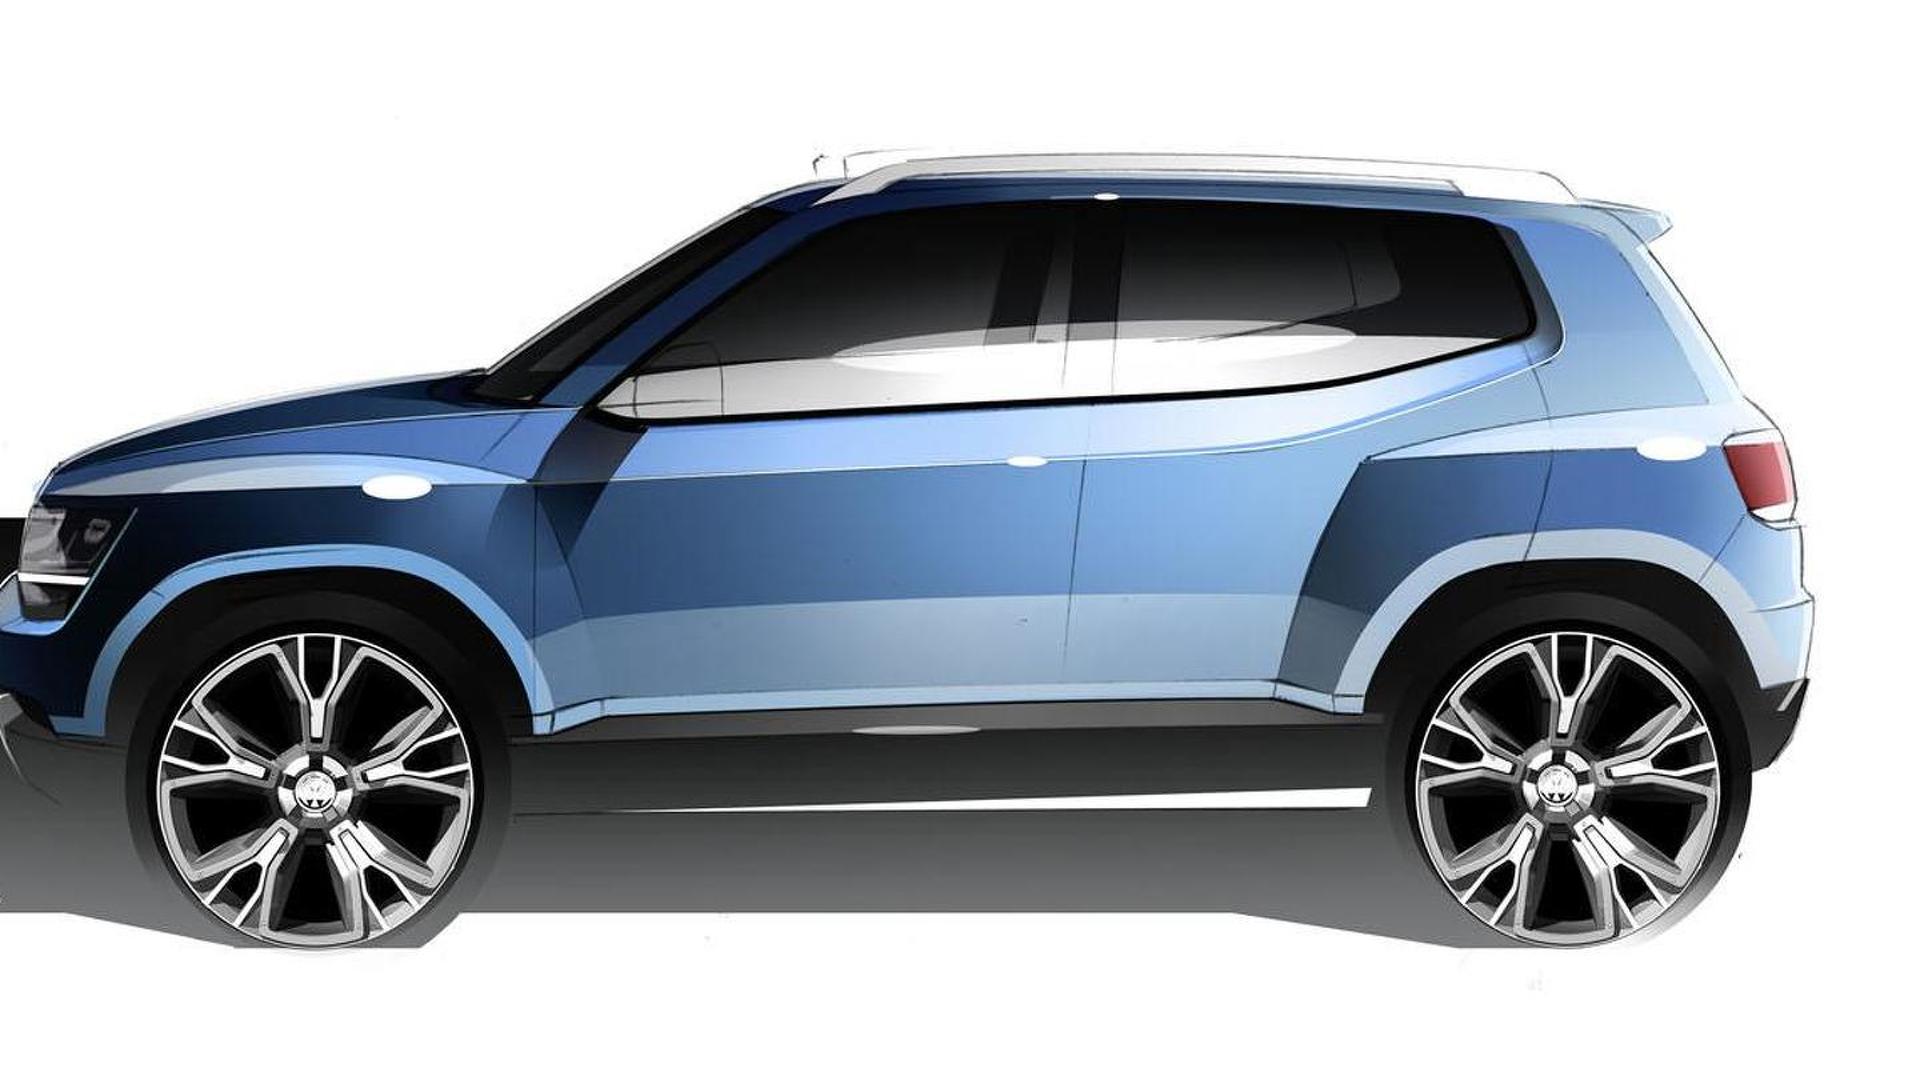 2012 339794 volkswagen taigun concept 22 10 20121